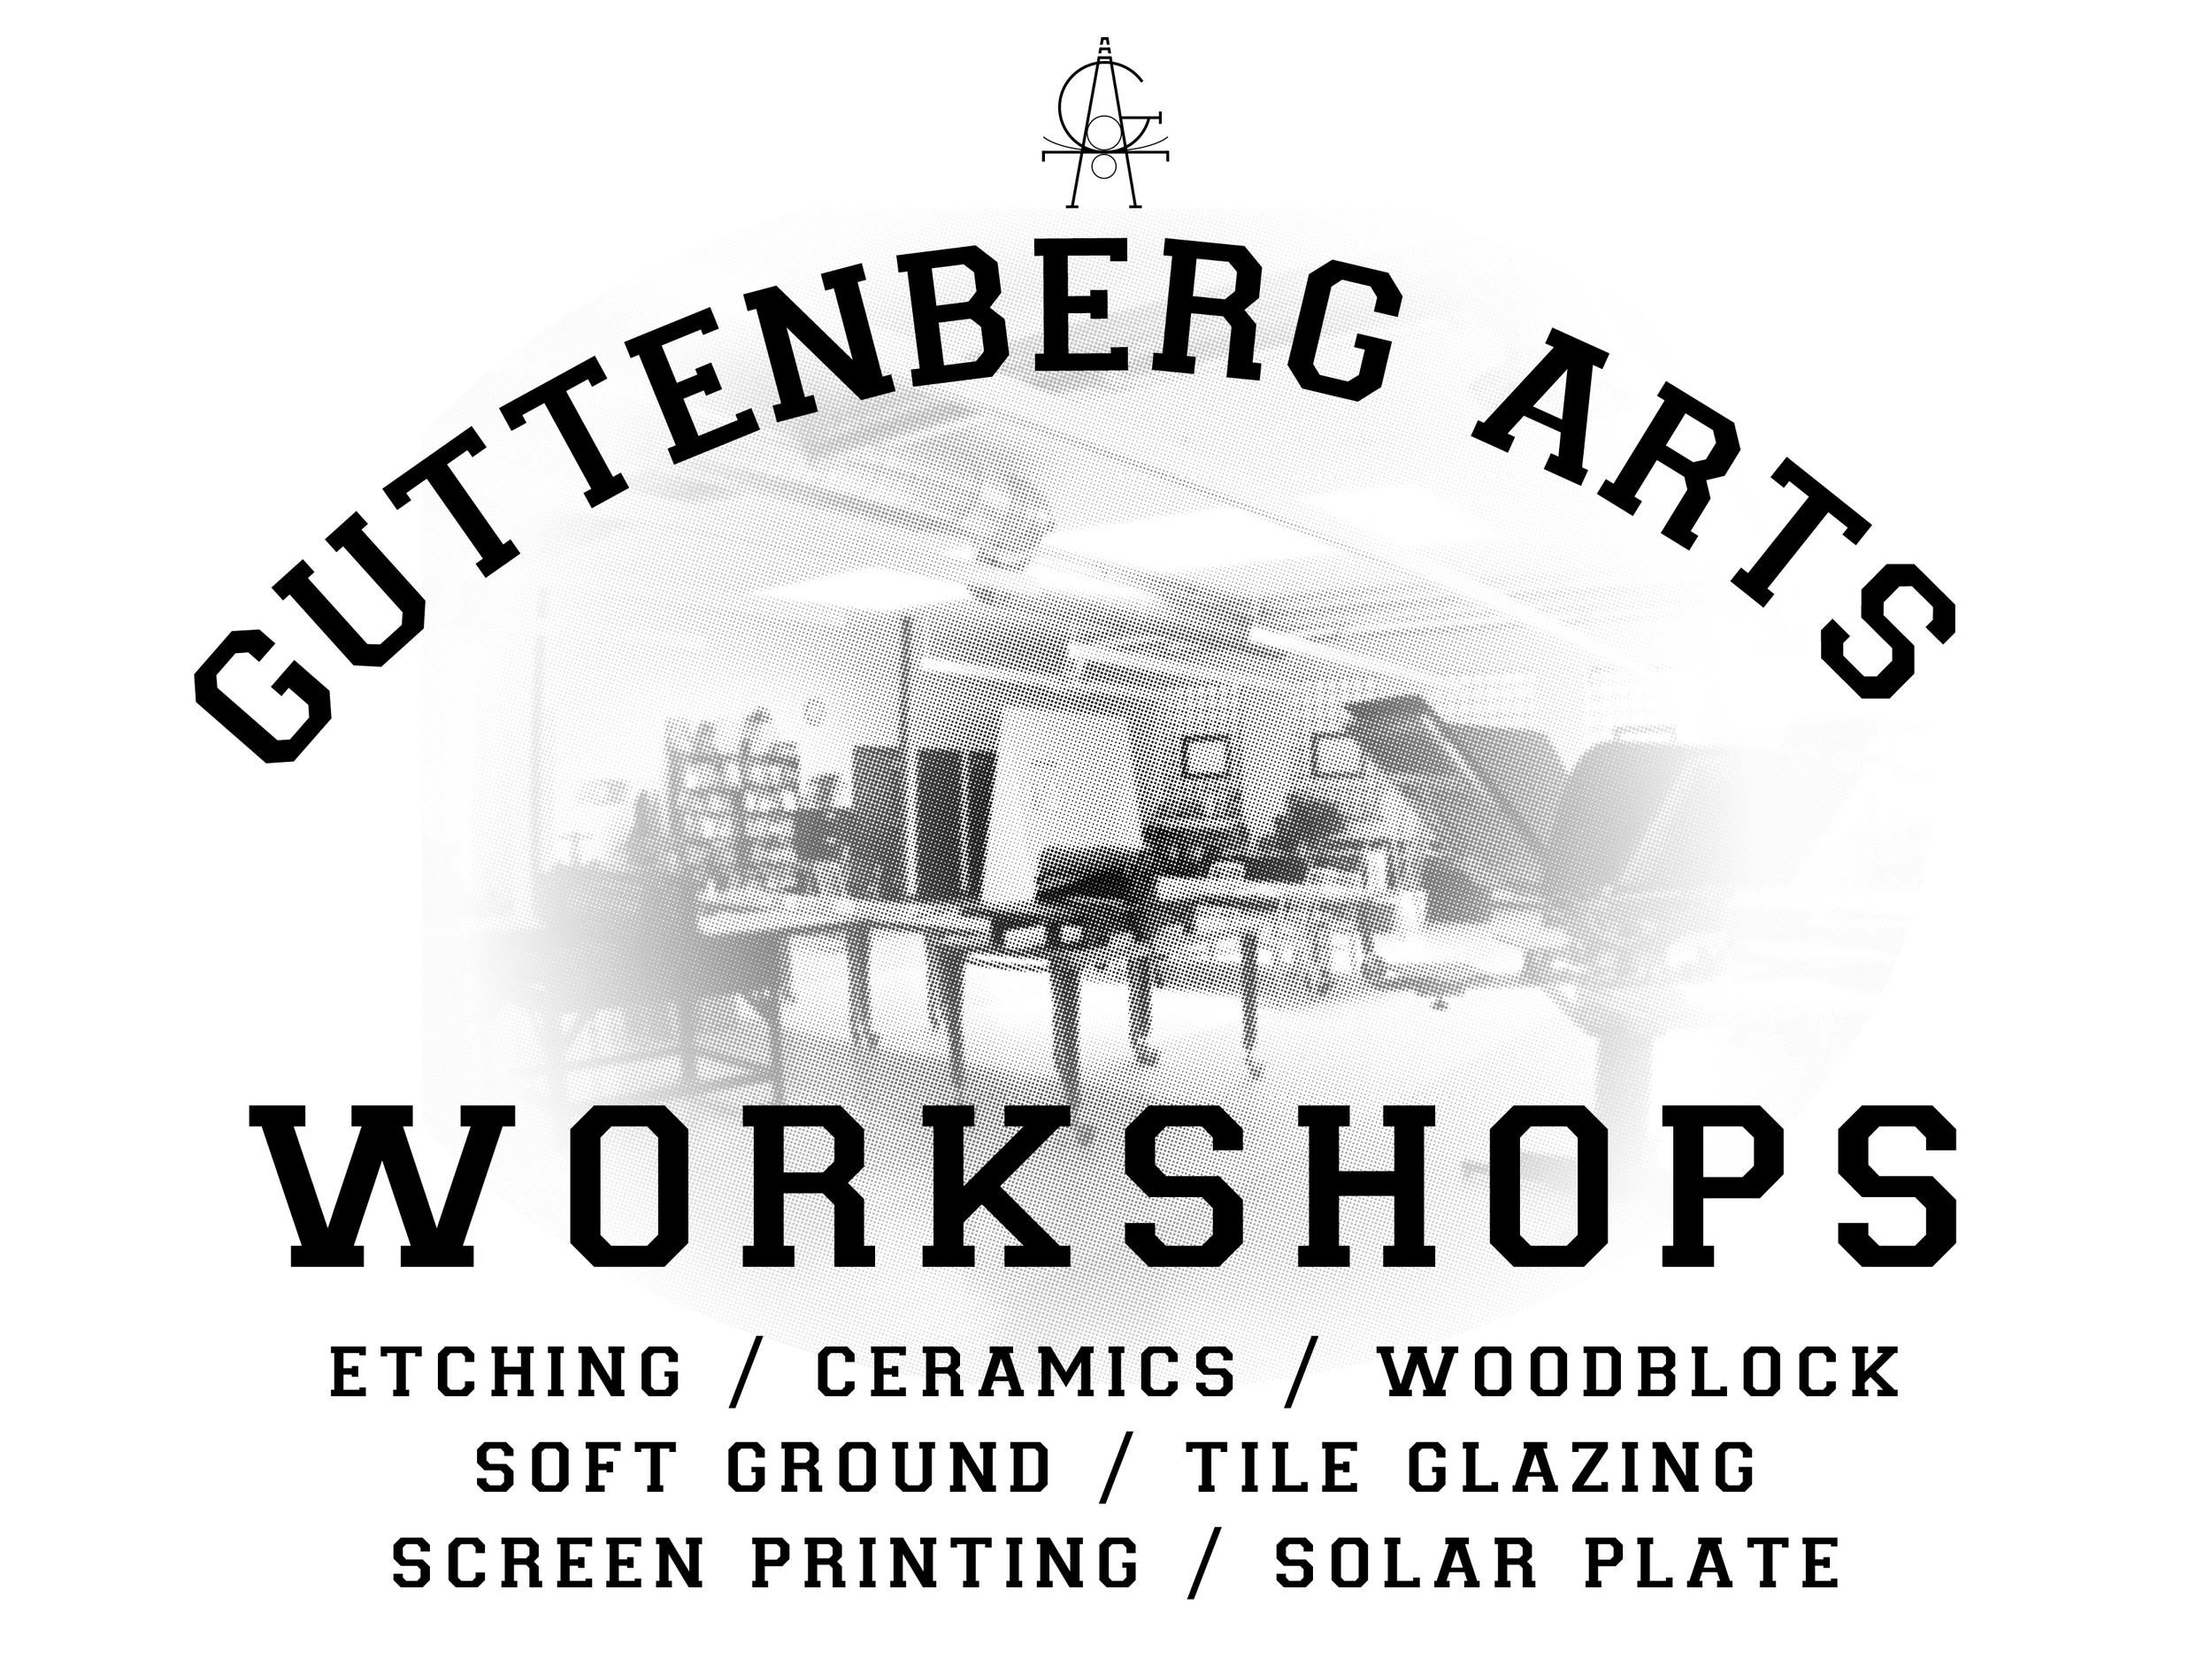 ga workshops.jpg